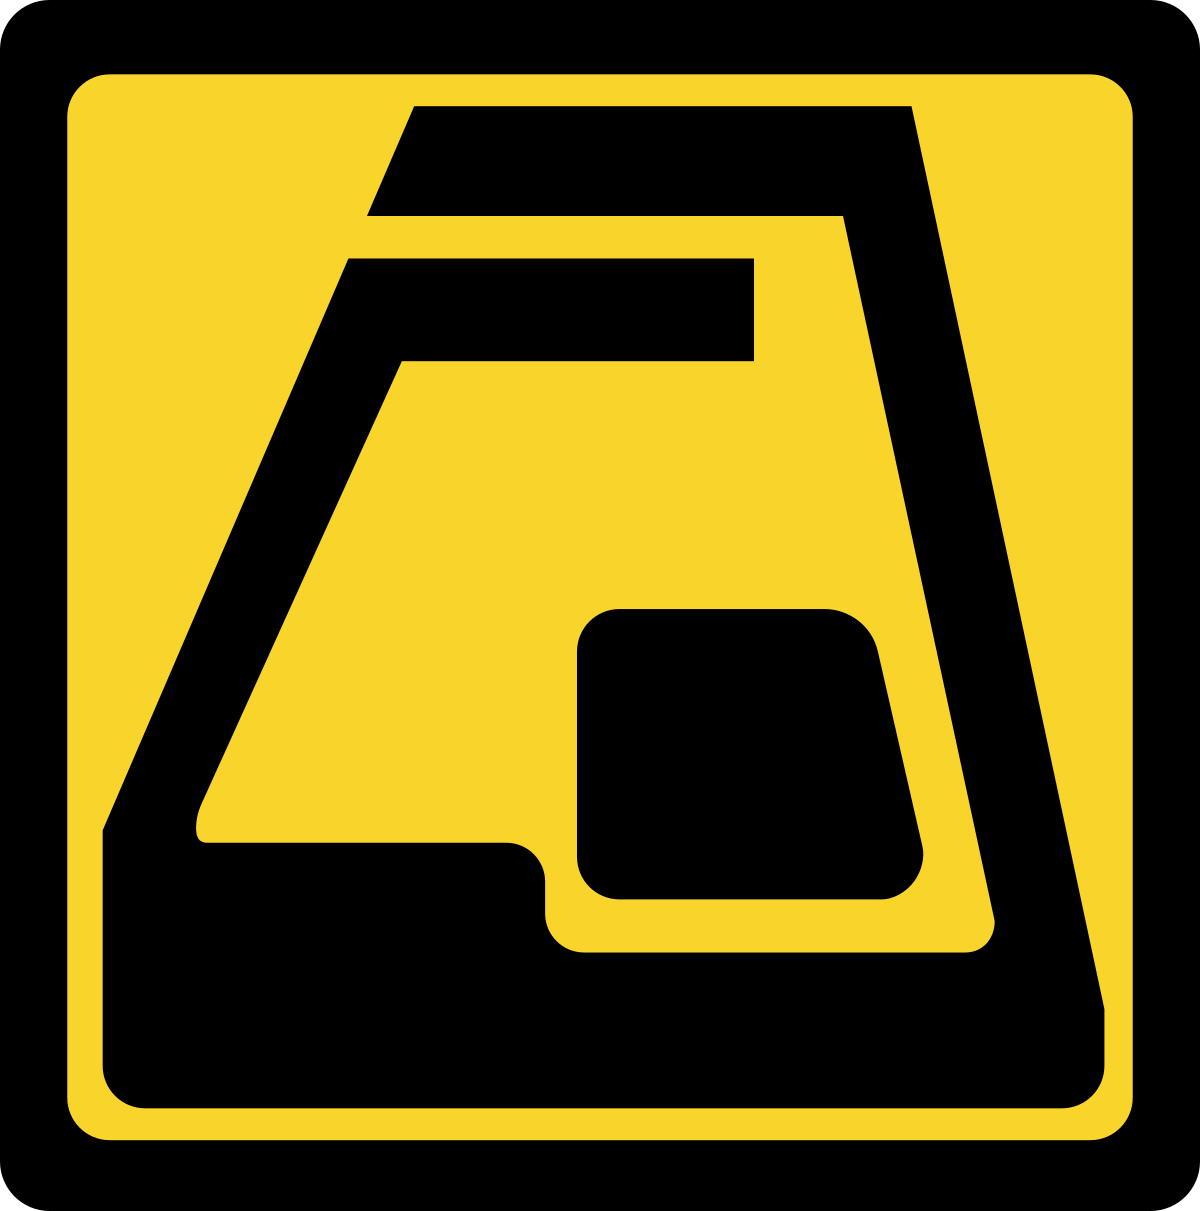 public://news/Tehran_Metro_Logo.jpg